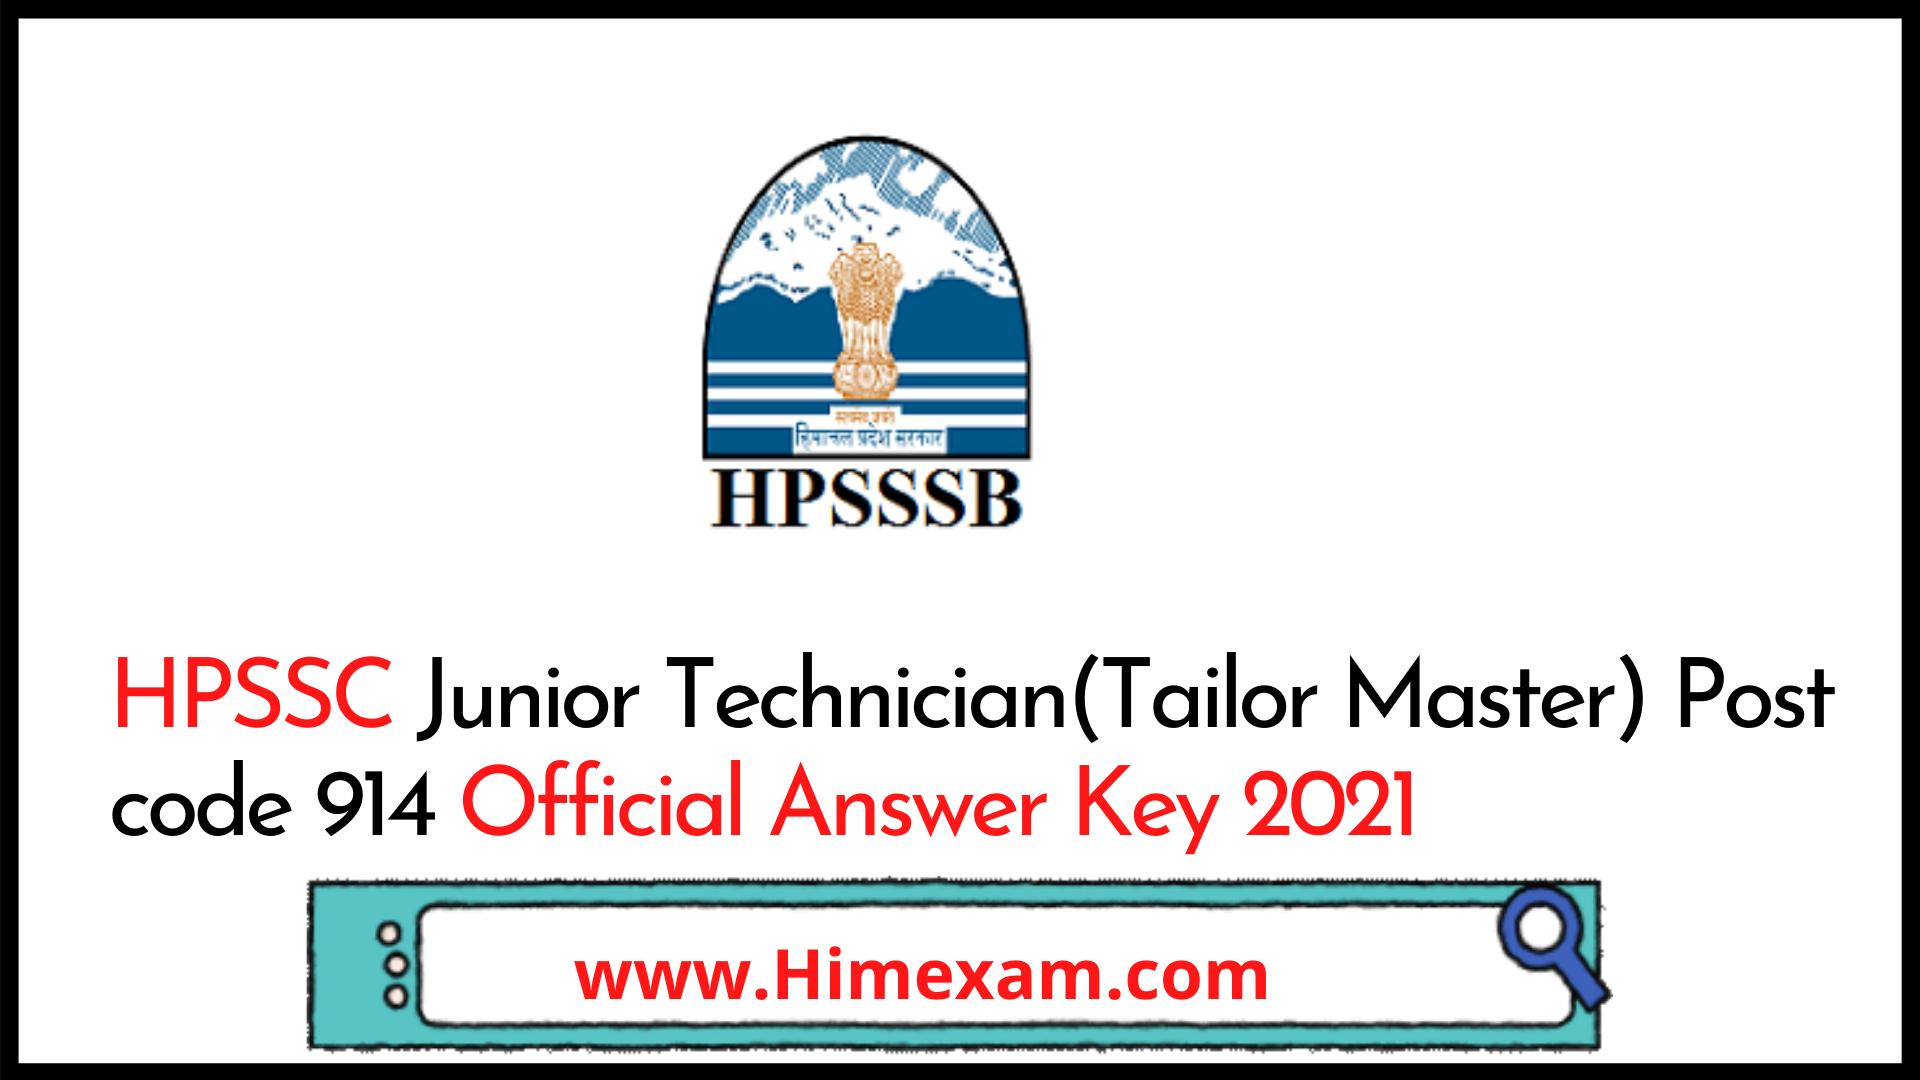 HPSSC Junior Technician(Tailor Master) Post code 914 Official Answer Key 2021